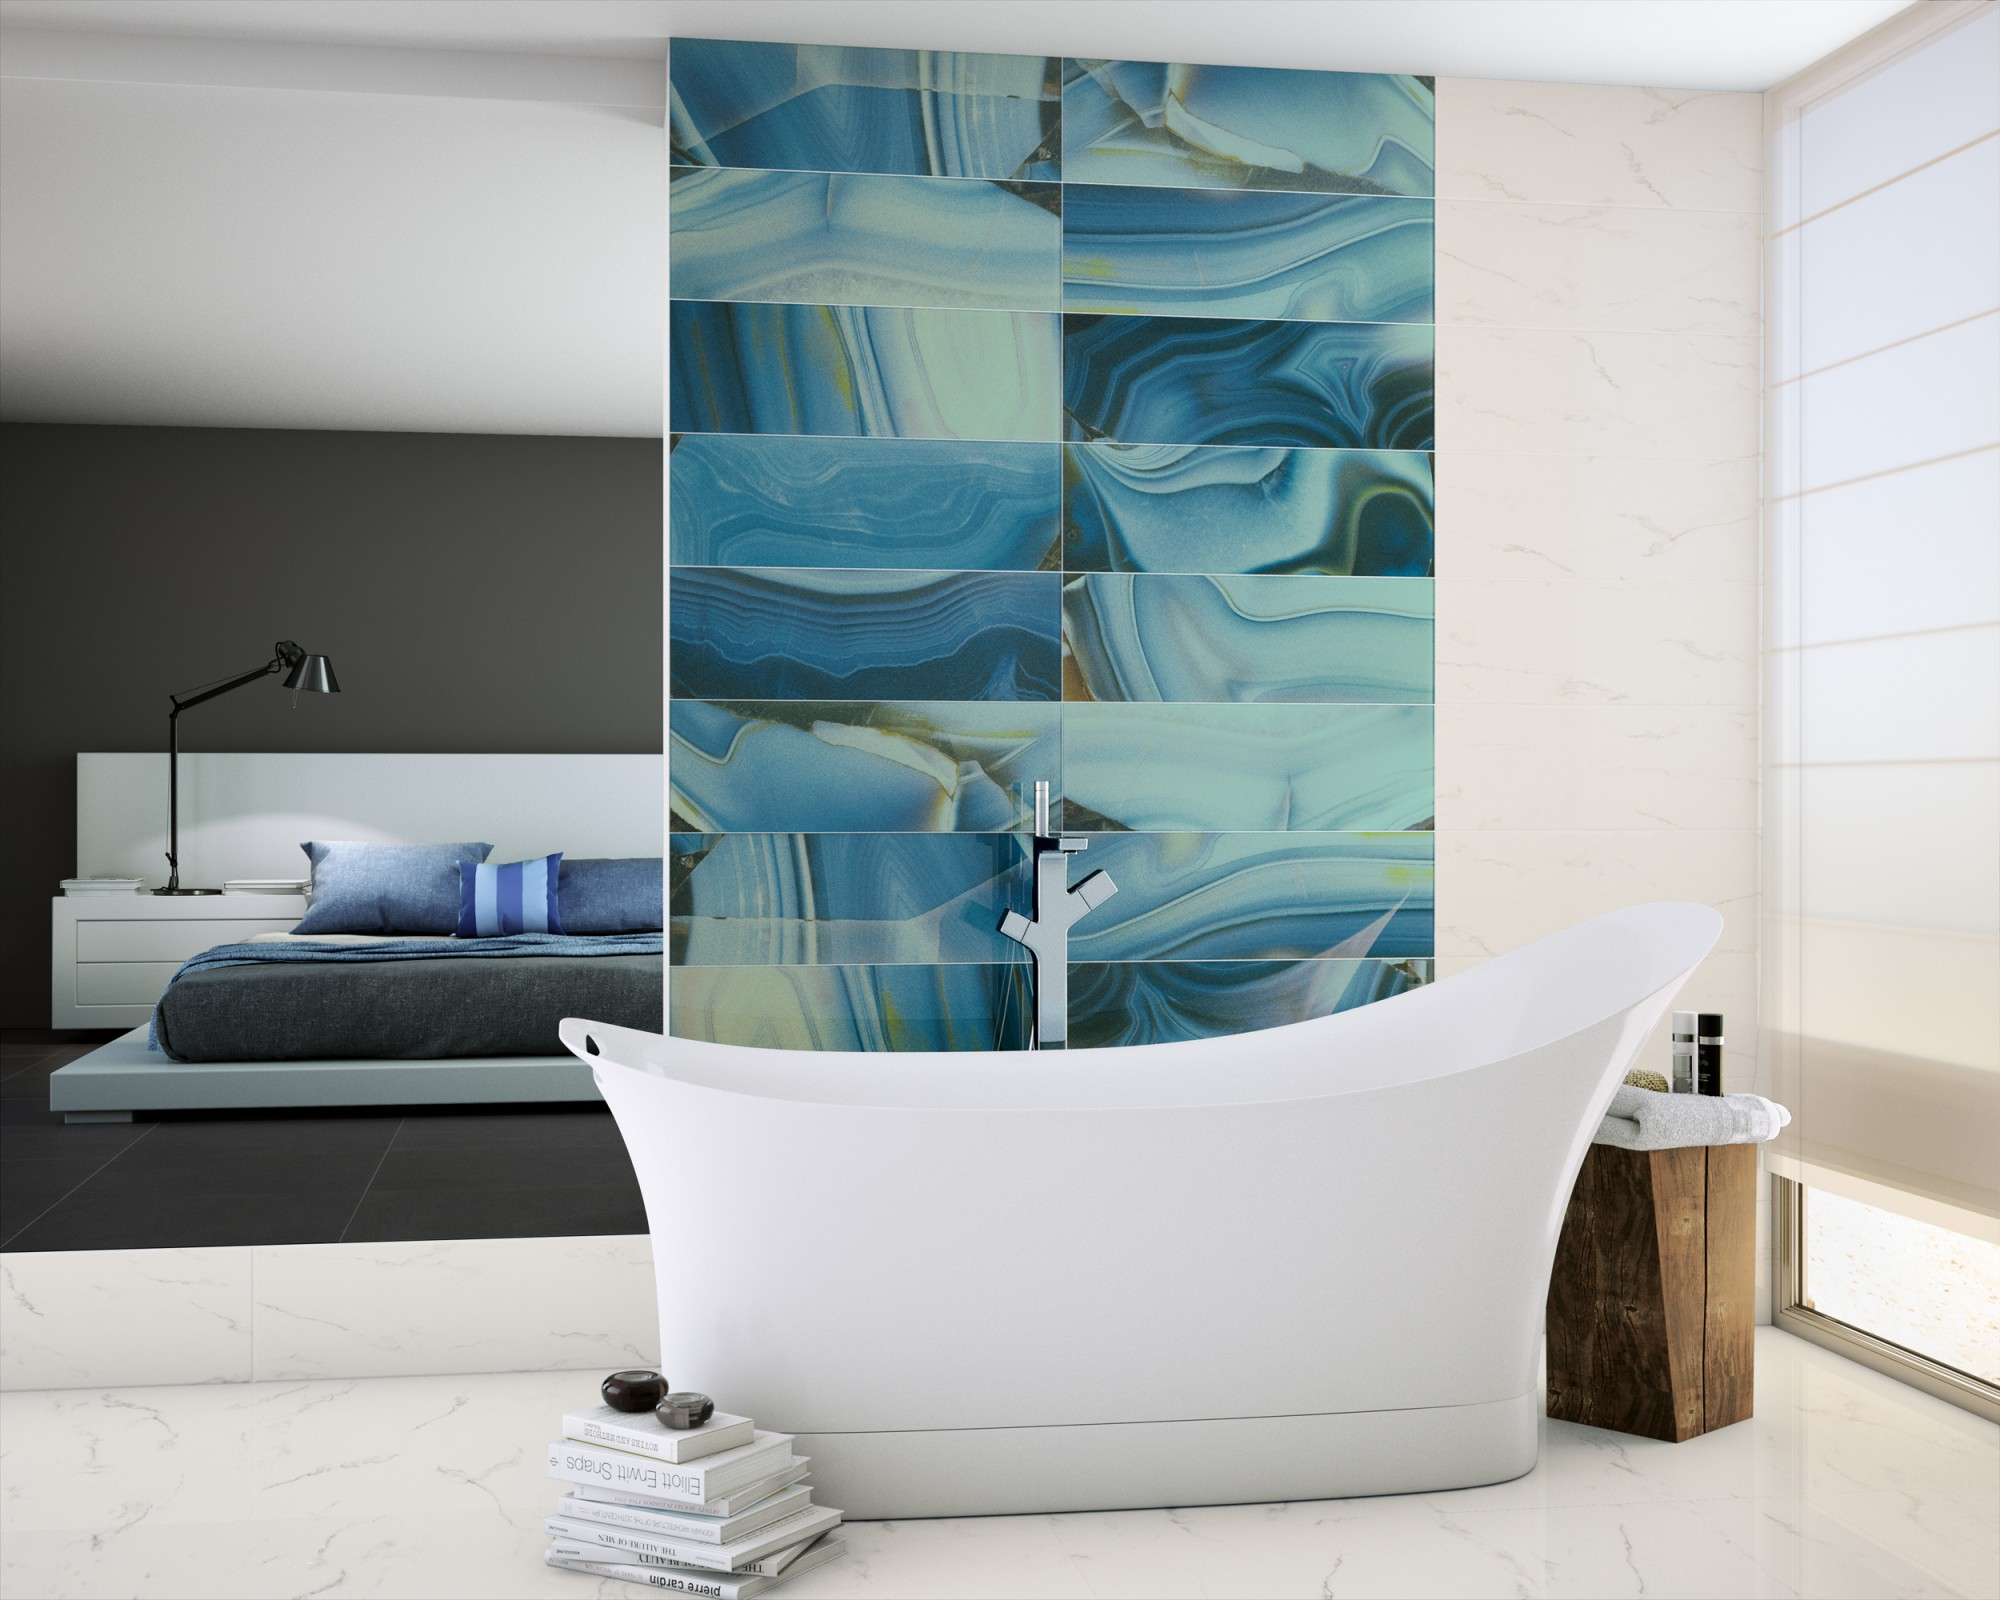 Aura Agate Glass tiles